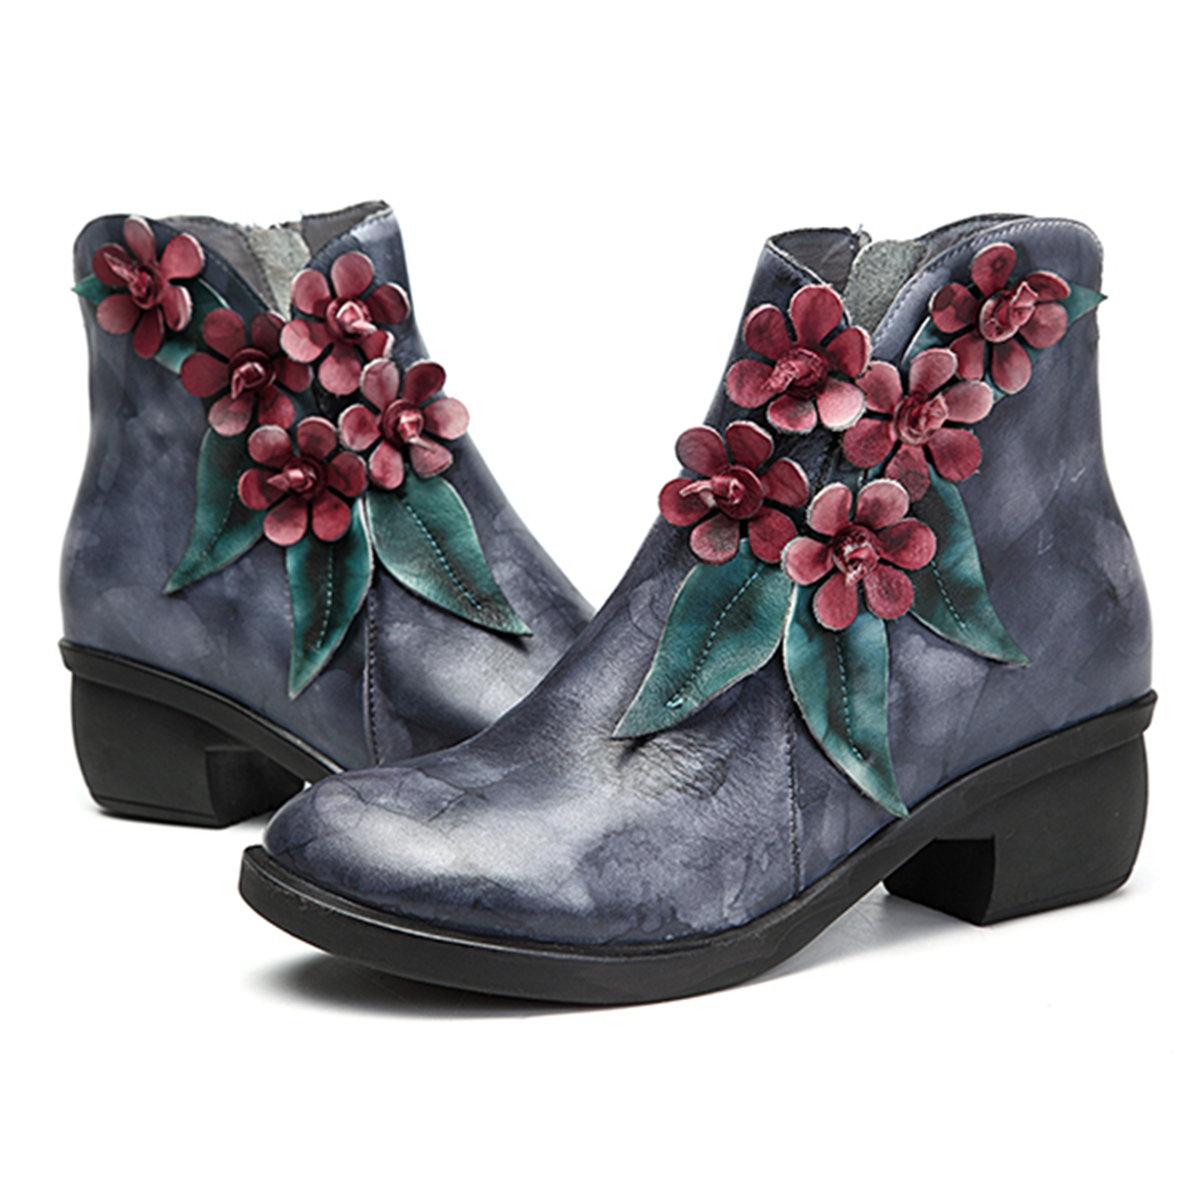 Socofy vintage shoes